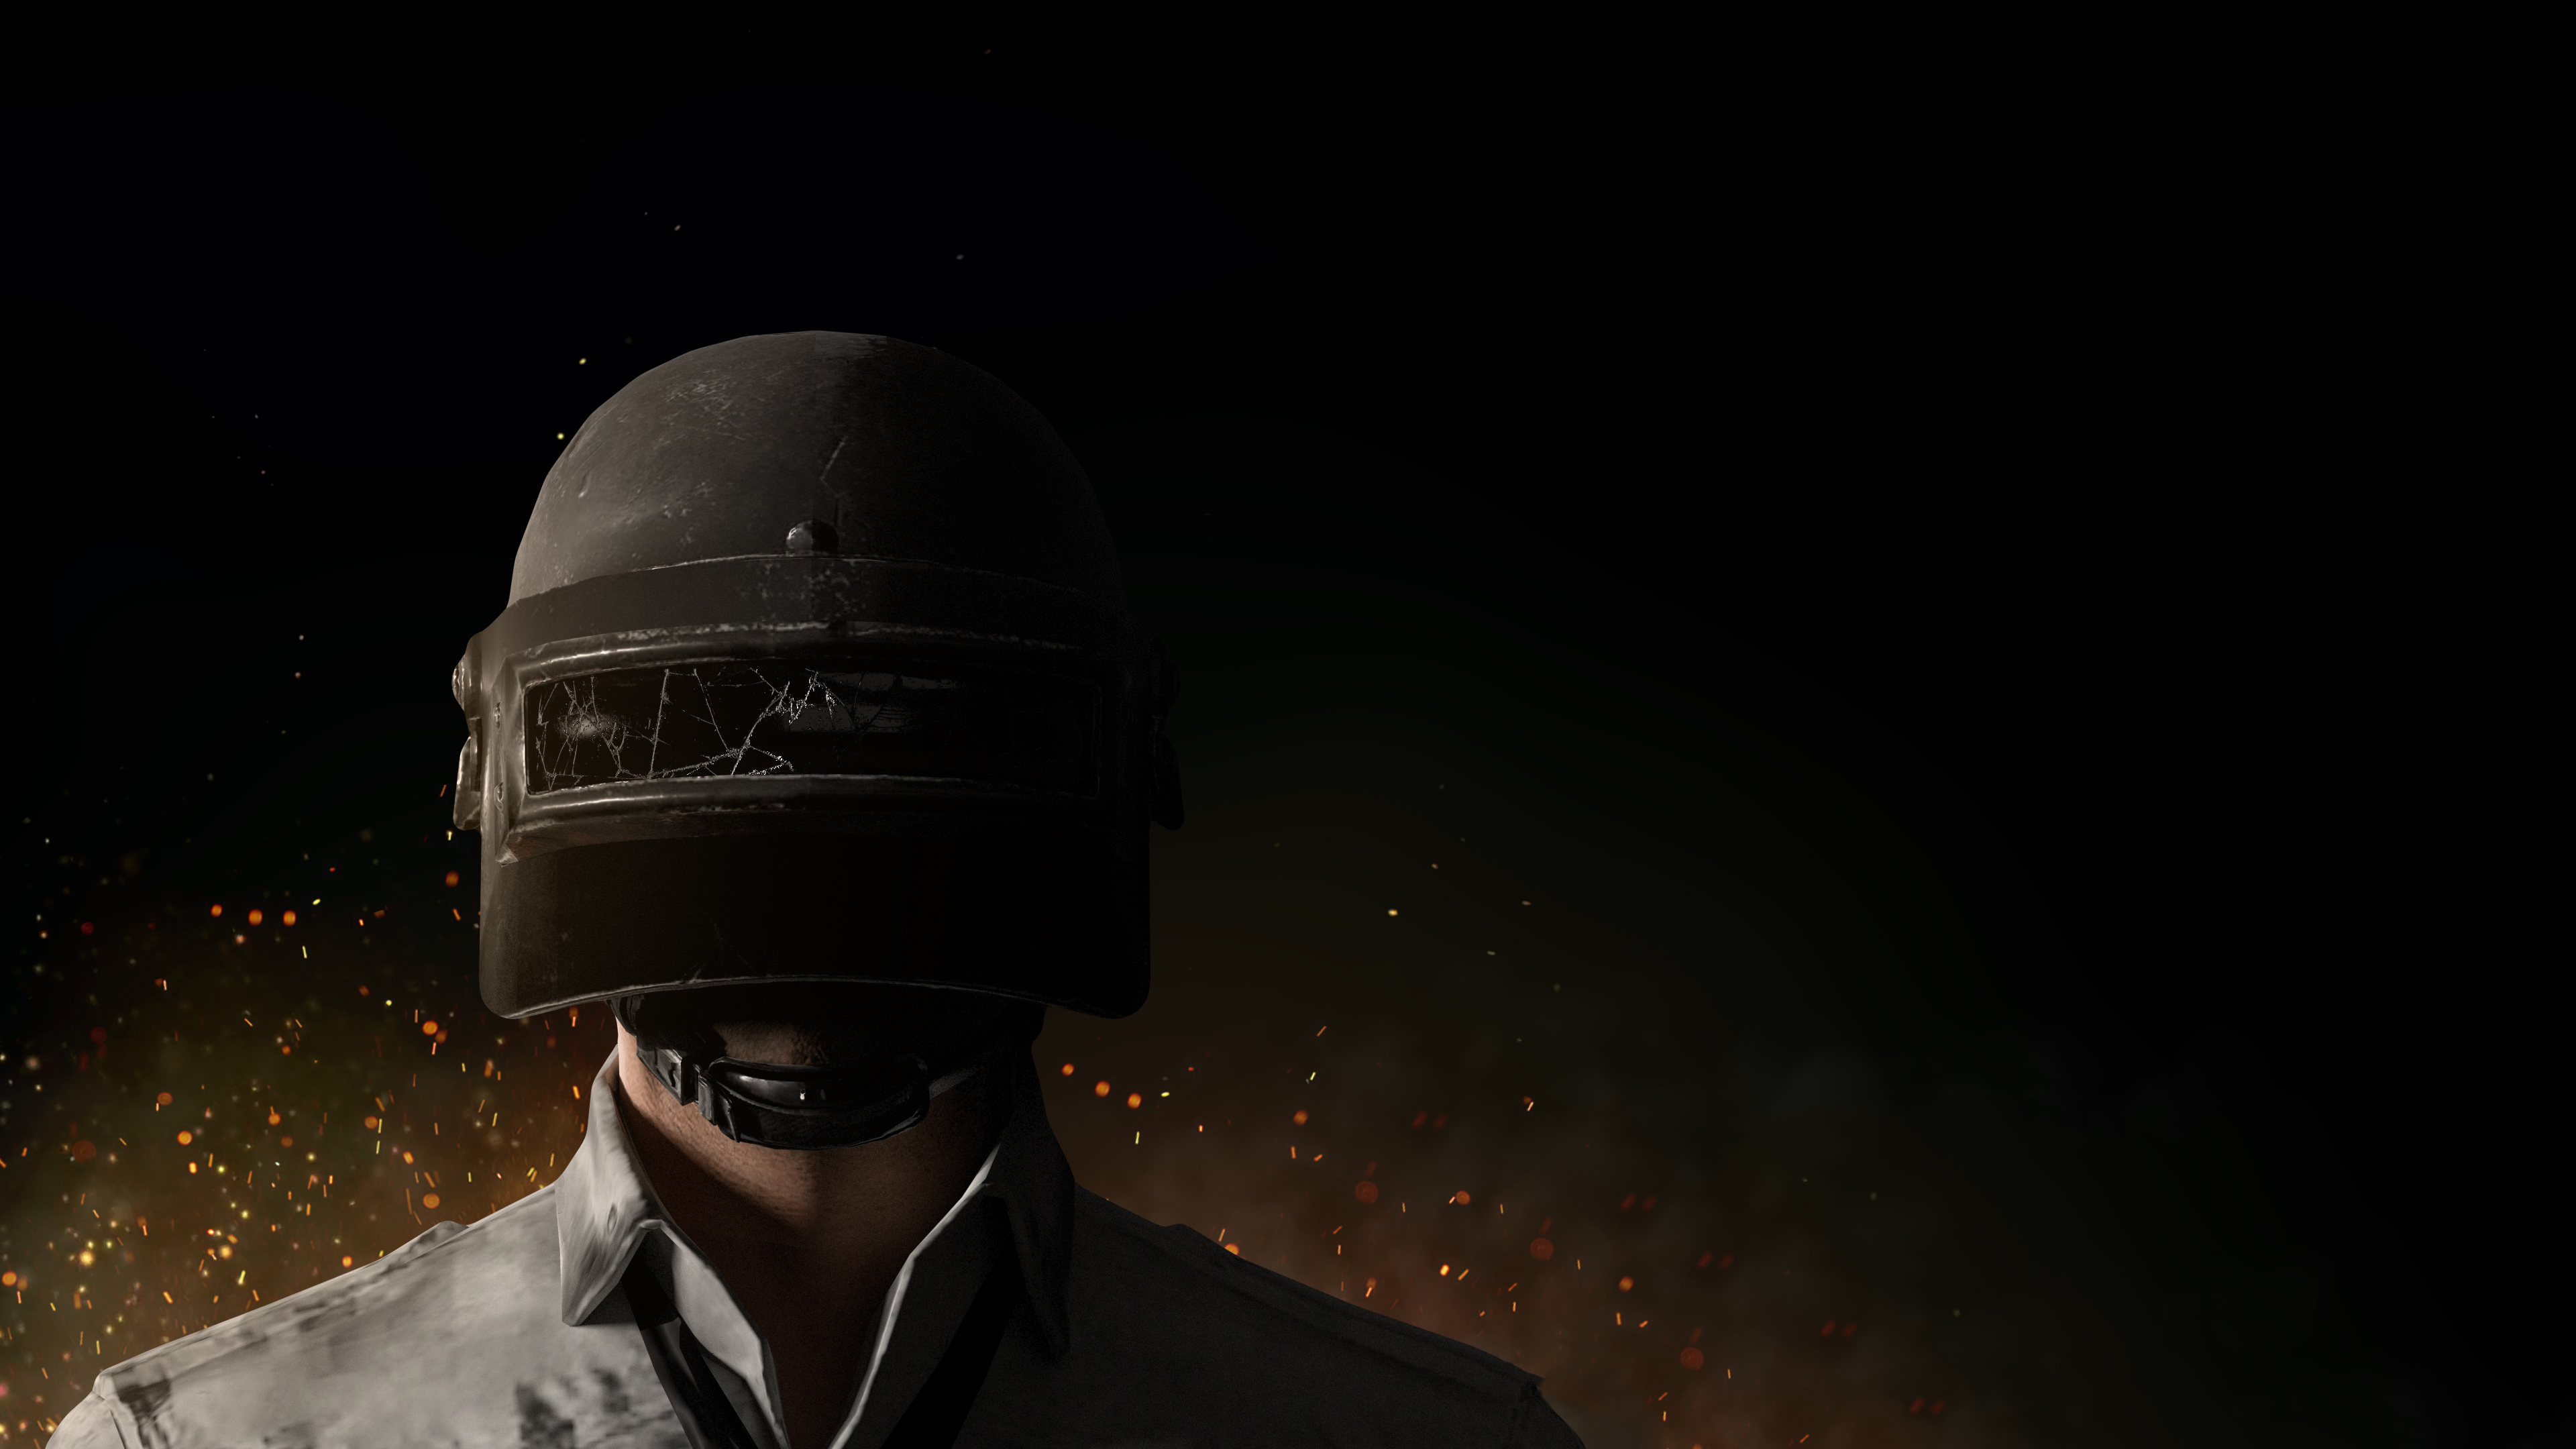 PUBG Helmet Guy 4k HD Games 4k Wallpapers Images Backgrounds 3840x2160